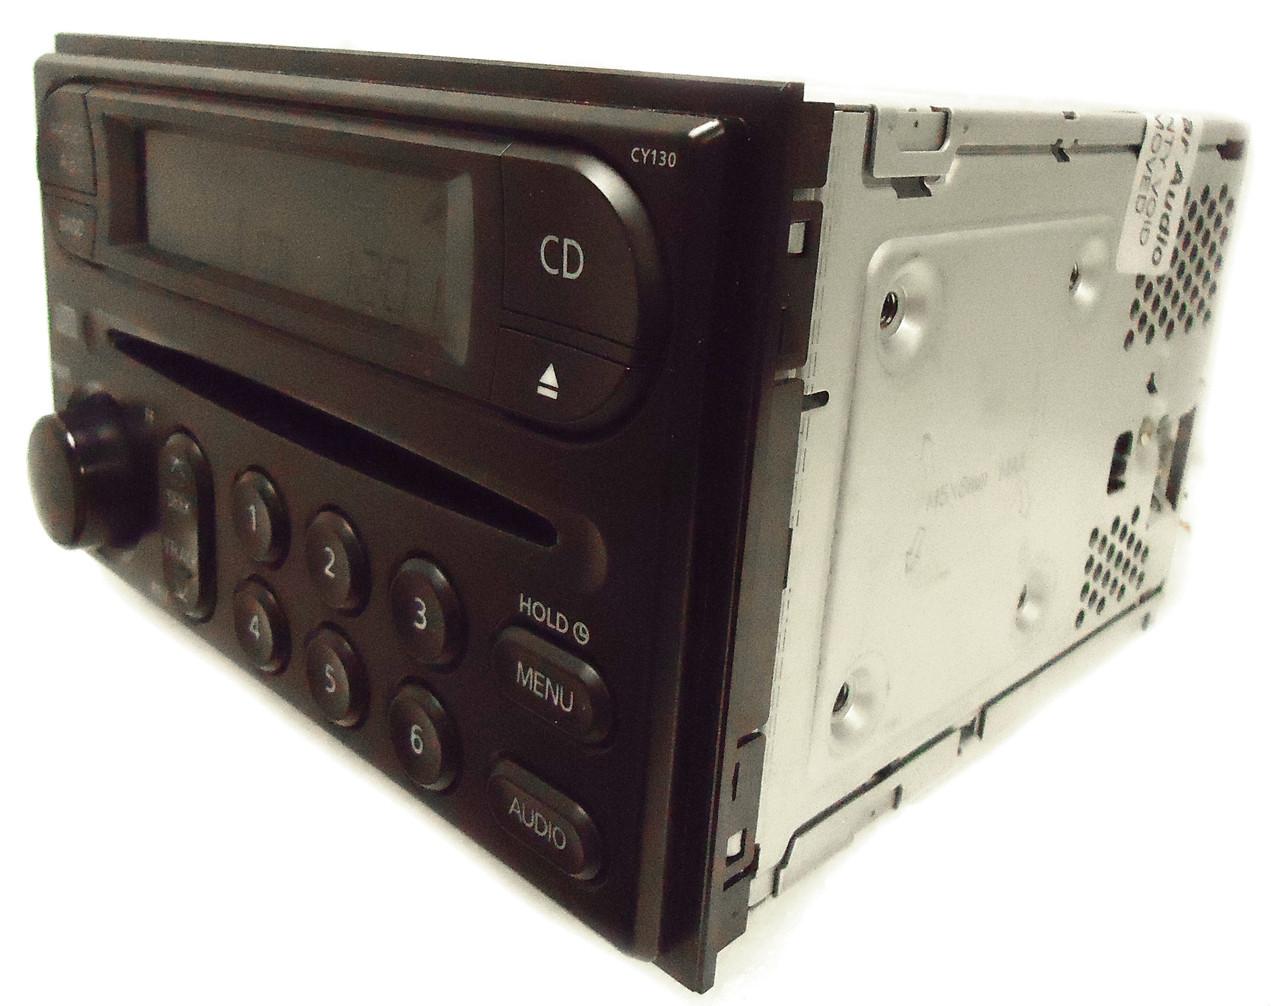 2004 nissan xterra rockford fosgate stereo wiring diagram 1965 ford mustang alternator 00 01 02 03 04 frontier radio cd player